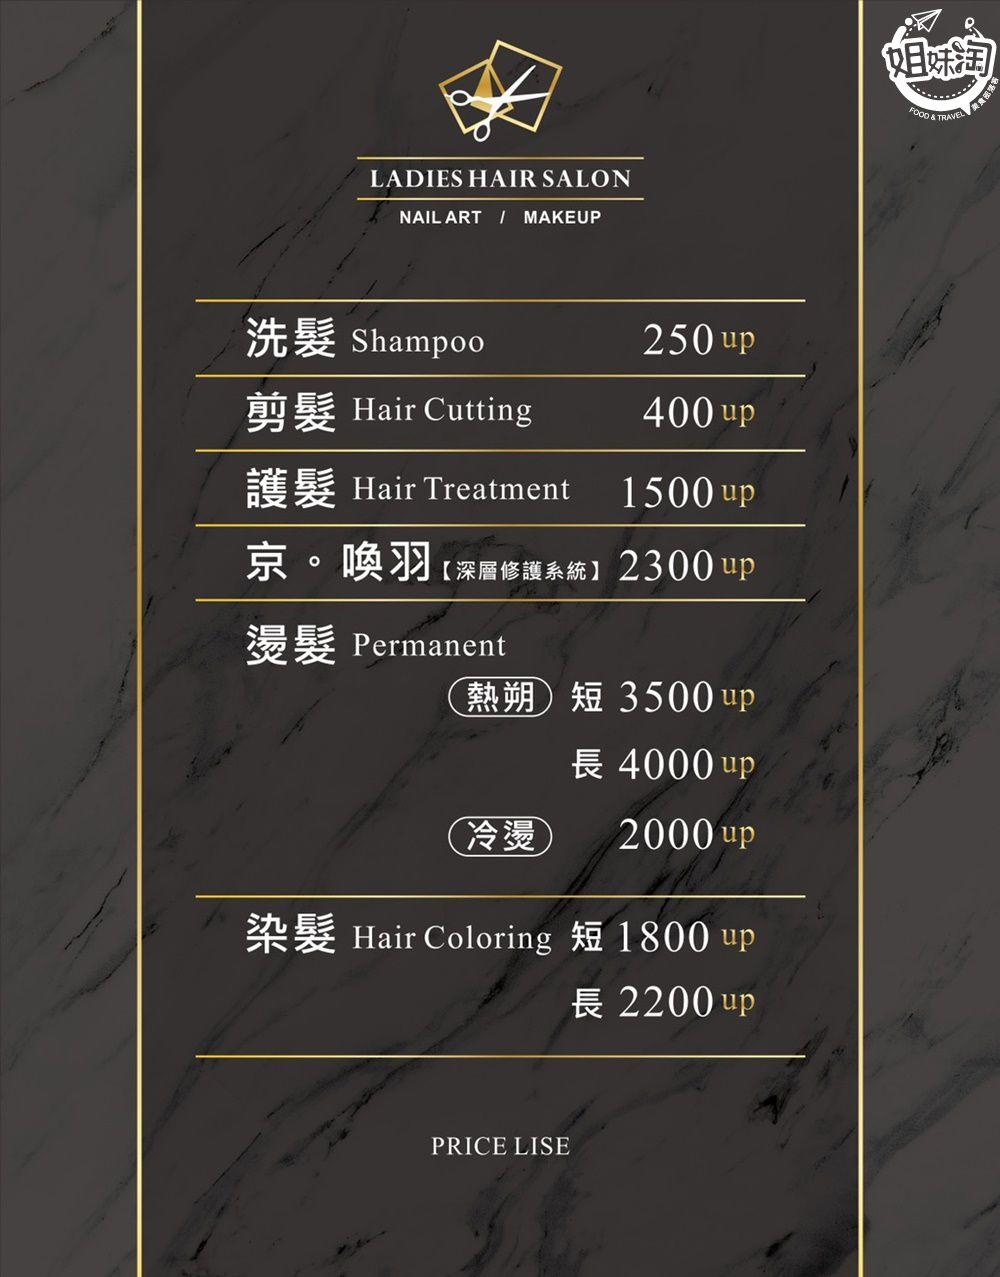 Ladies Hair Salon價格,高雄夜間洗髮,高雄夜間美甲,高雄妝髮,高雄整體造型,高雄幫忙化妝,高雄幫人化妝的店,高雄代客化妝